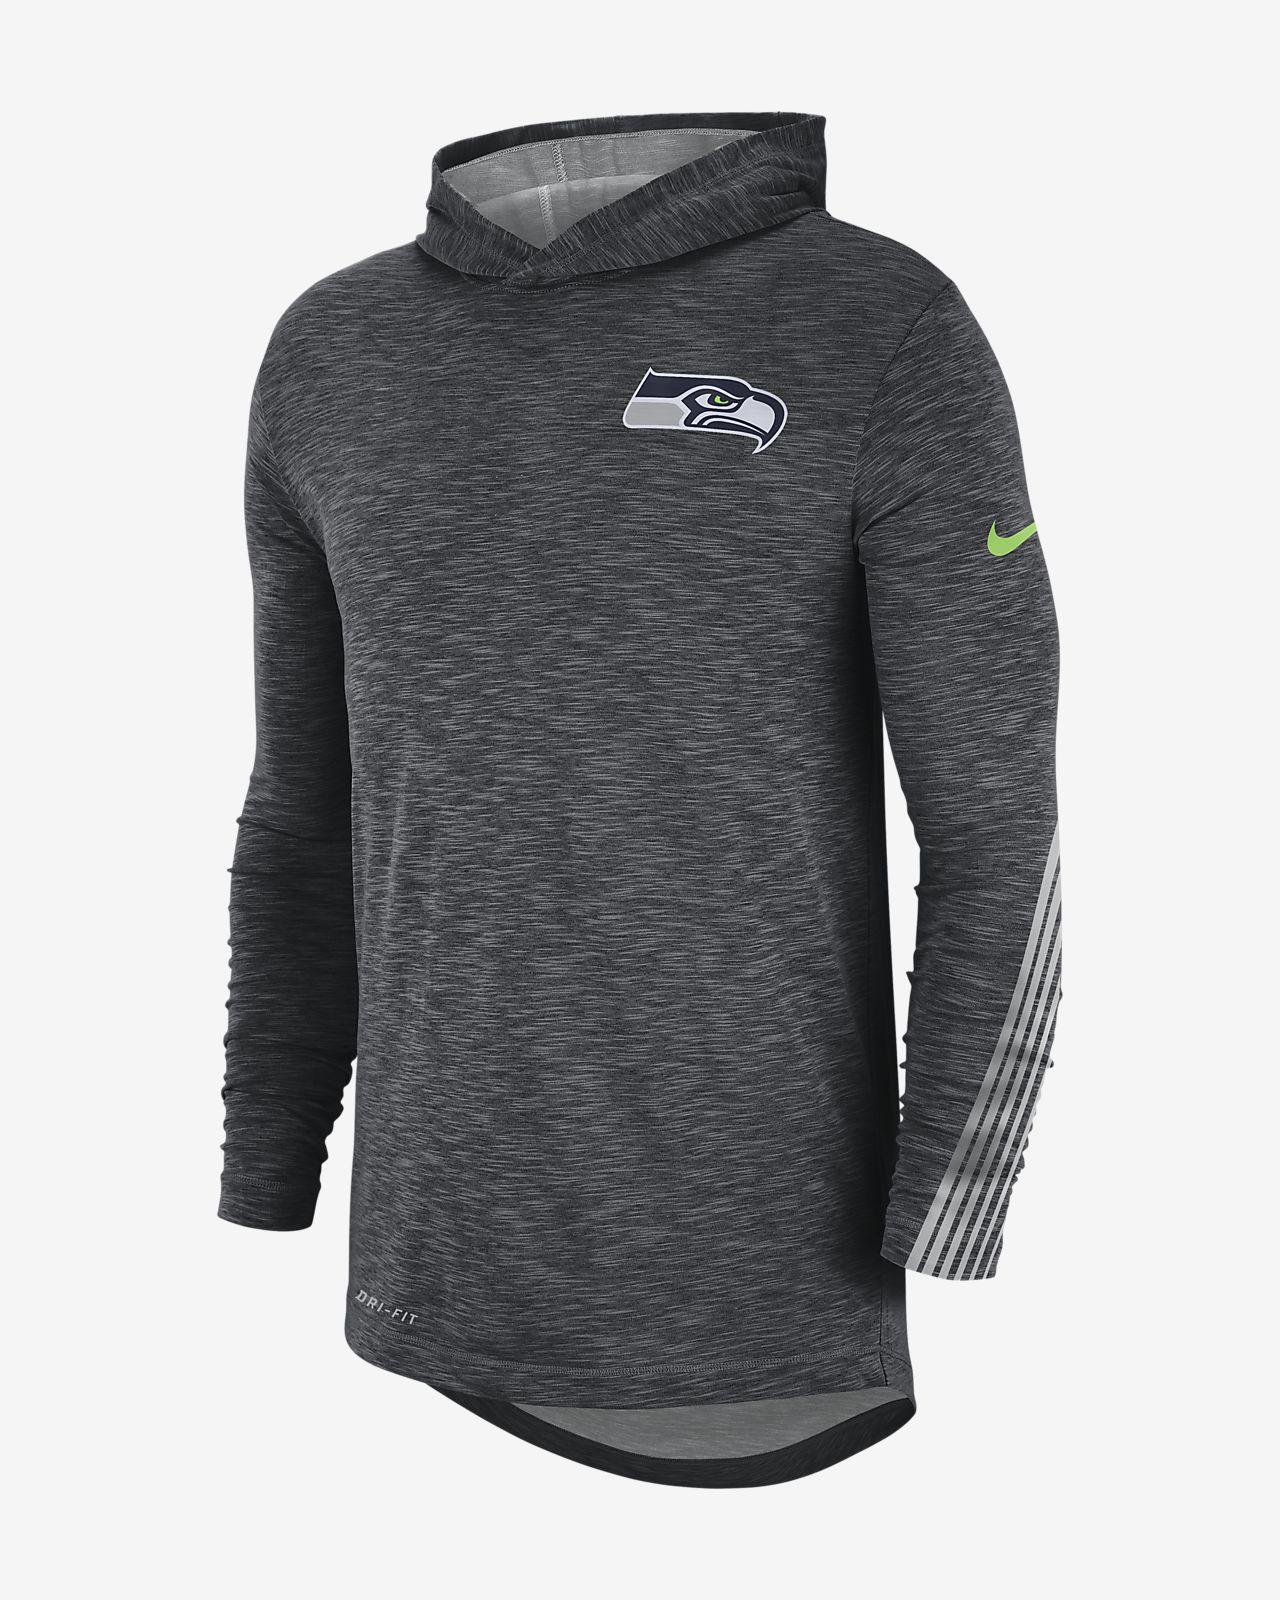 quality design e1af7 52d5f Nike Dri-FIT (NFL Seahawks) Men's Hoodie